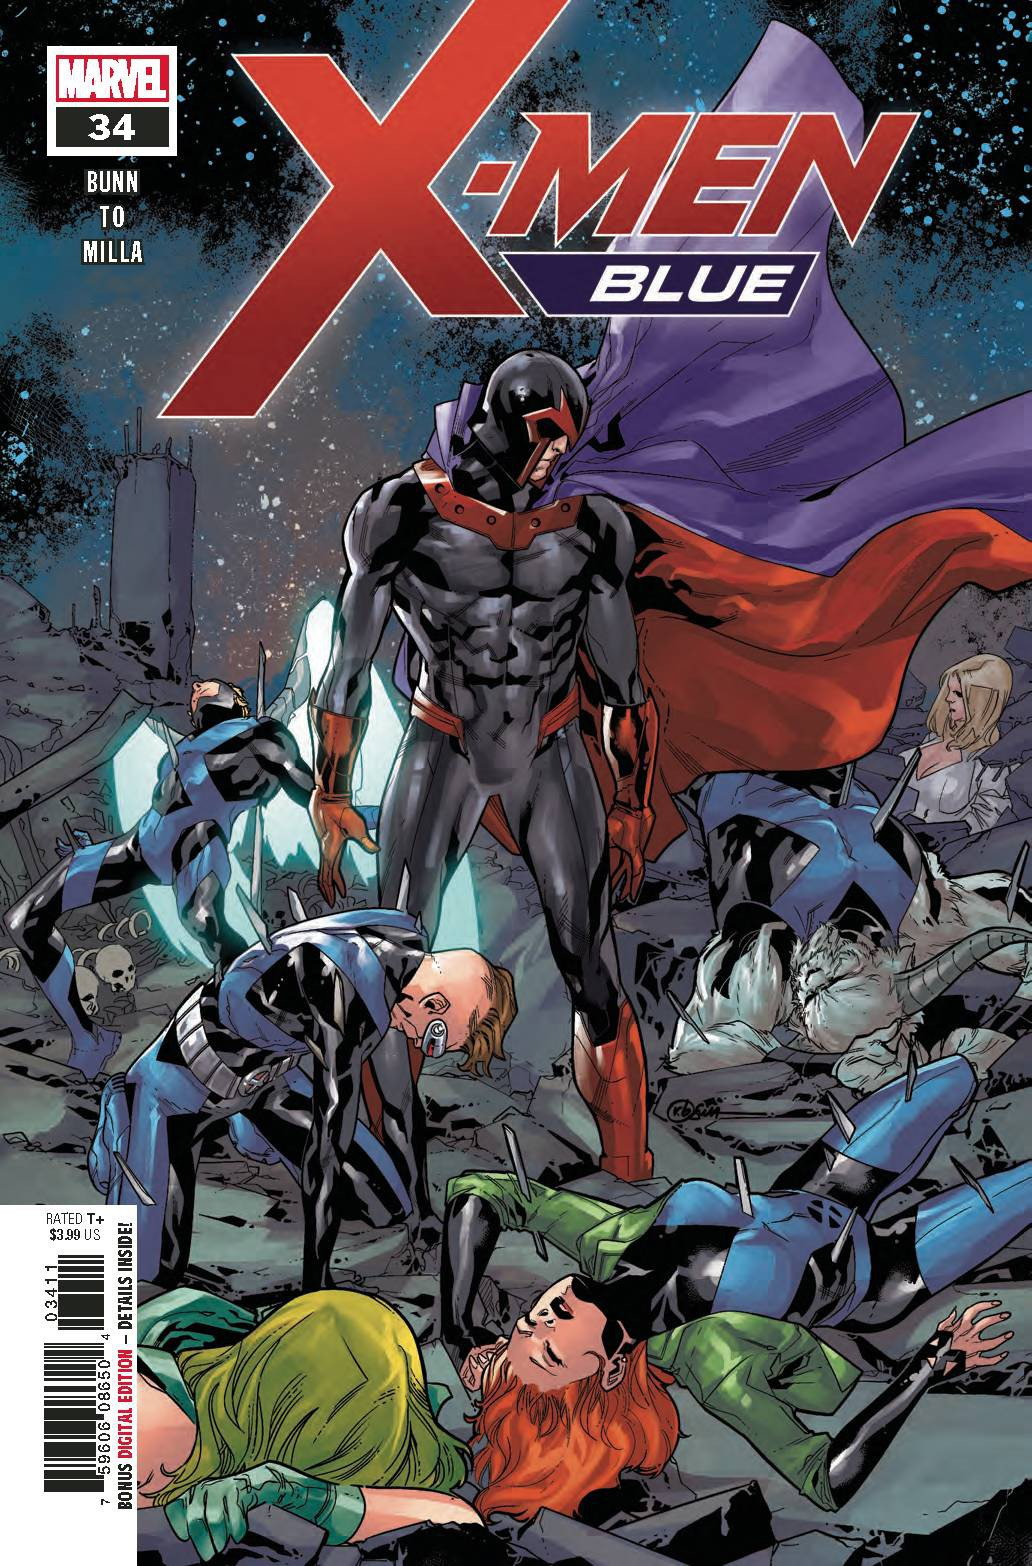 Marvel X-Men Blue #34 by